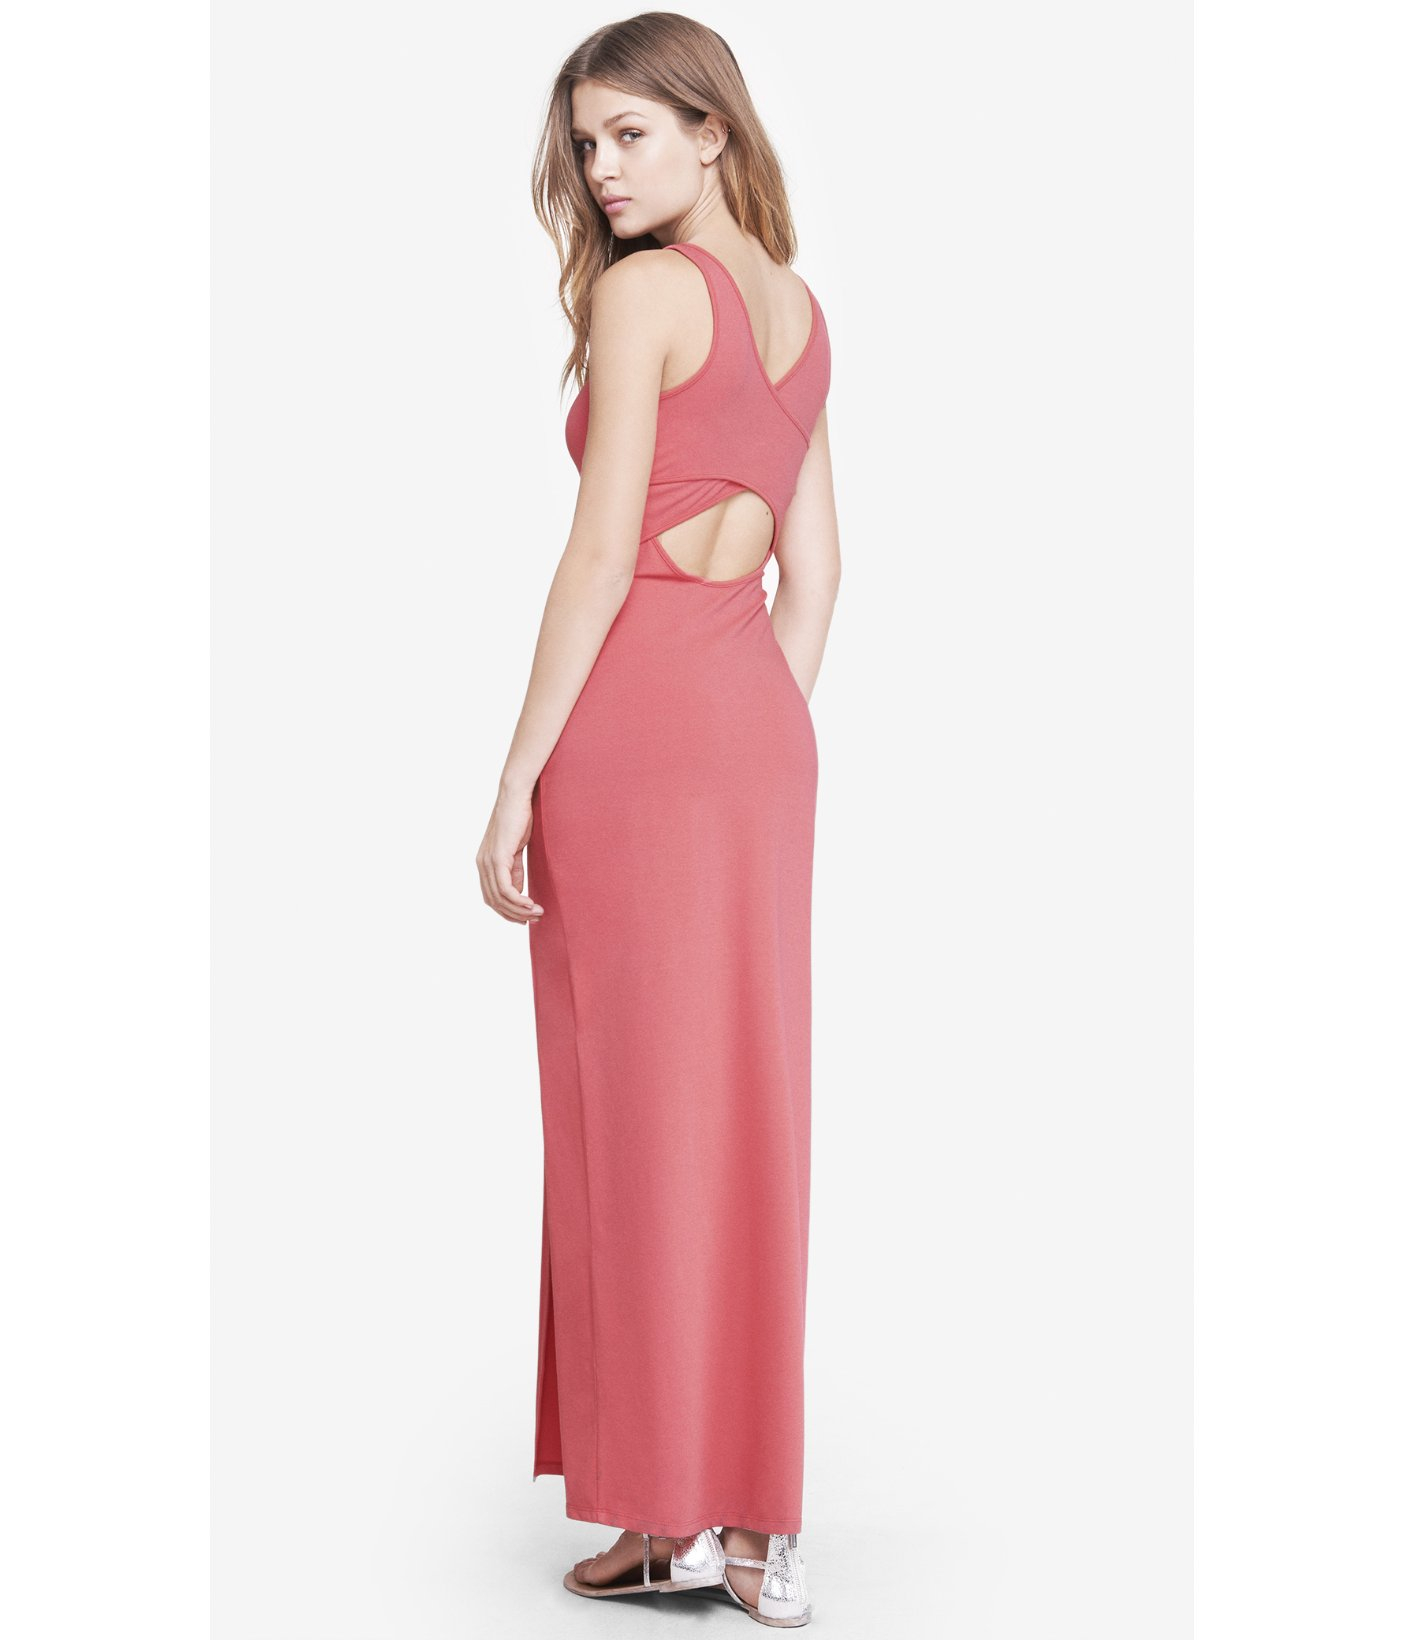 2e0c9066fb Lyst - Express Pink Crisscross Back Maxi Dress in Pink